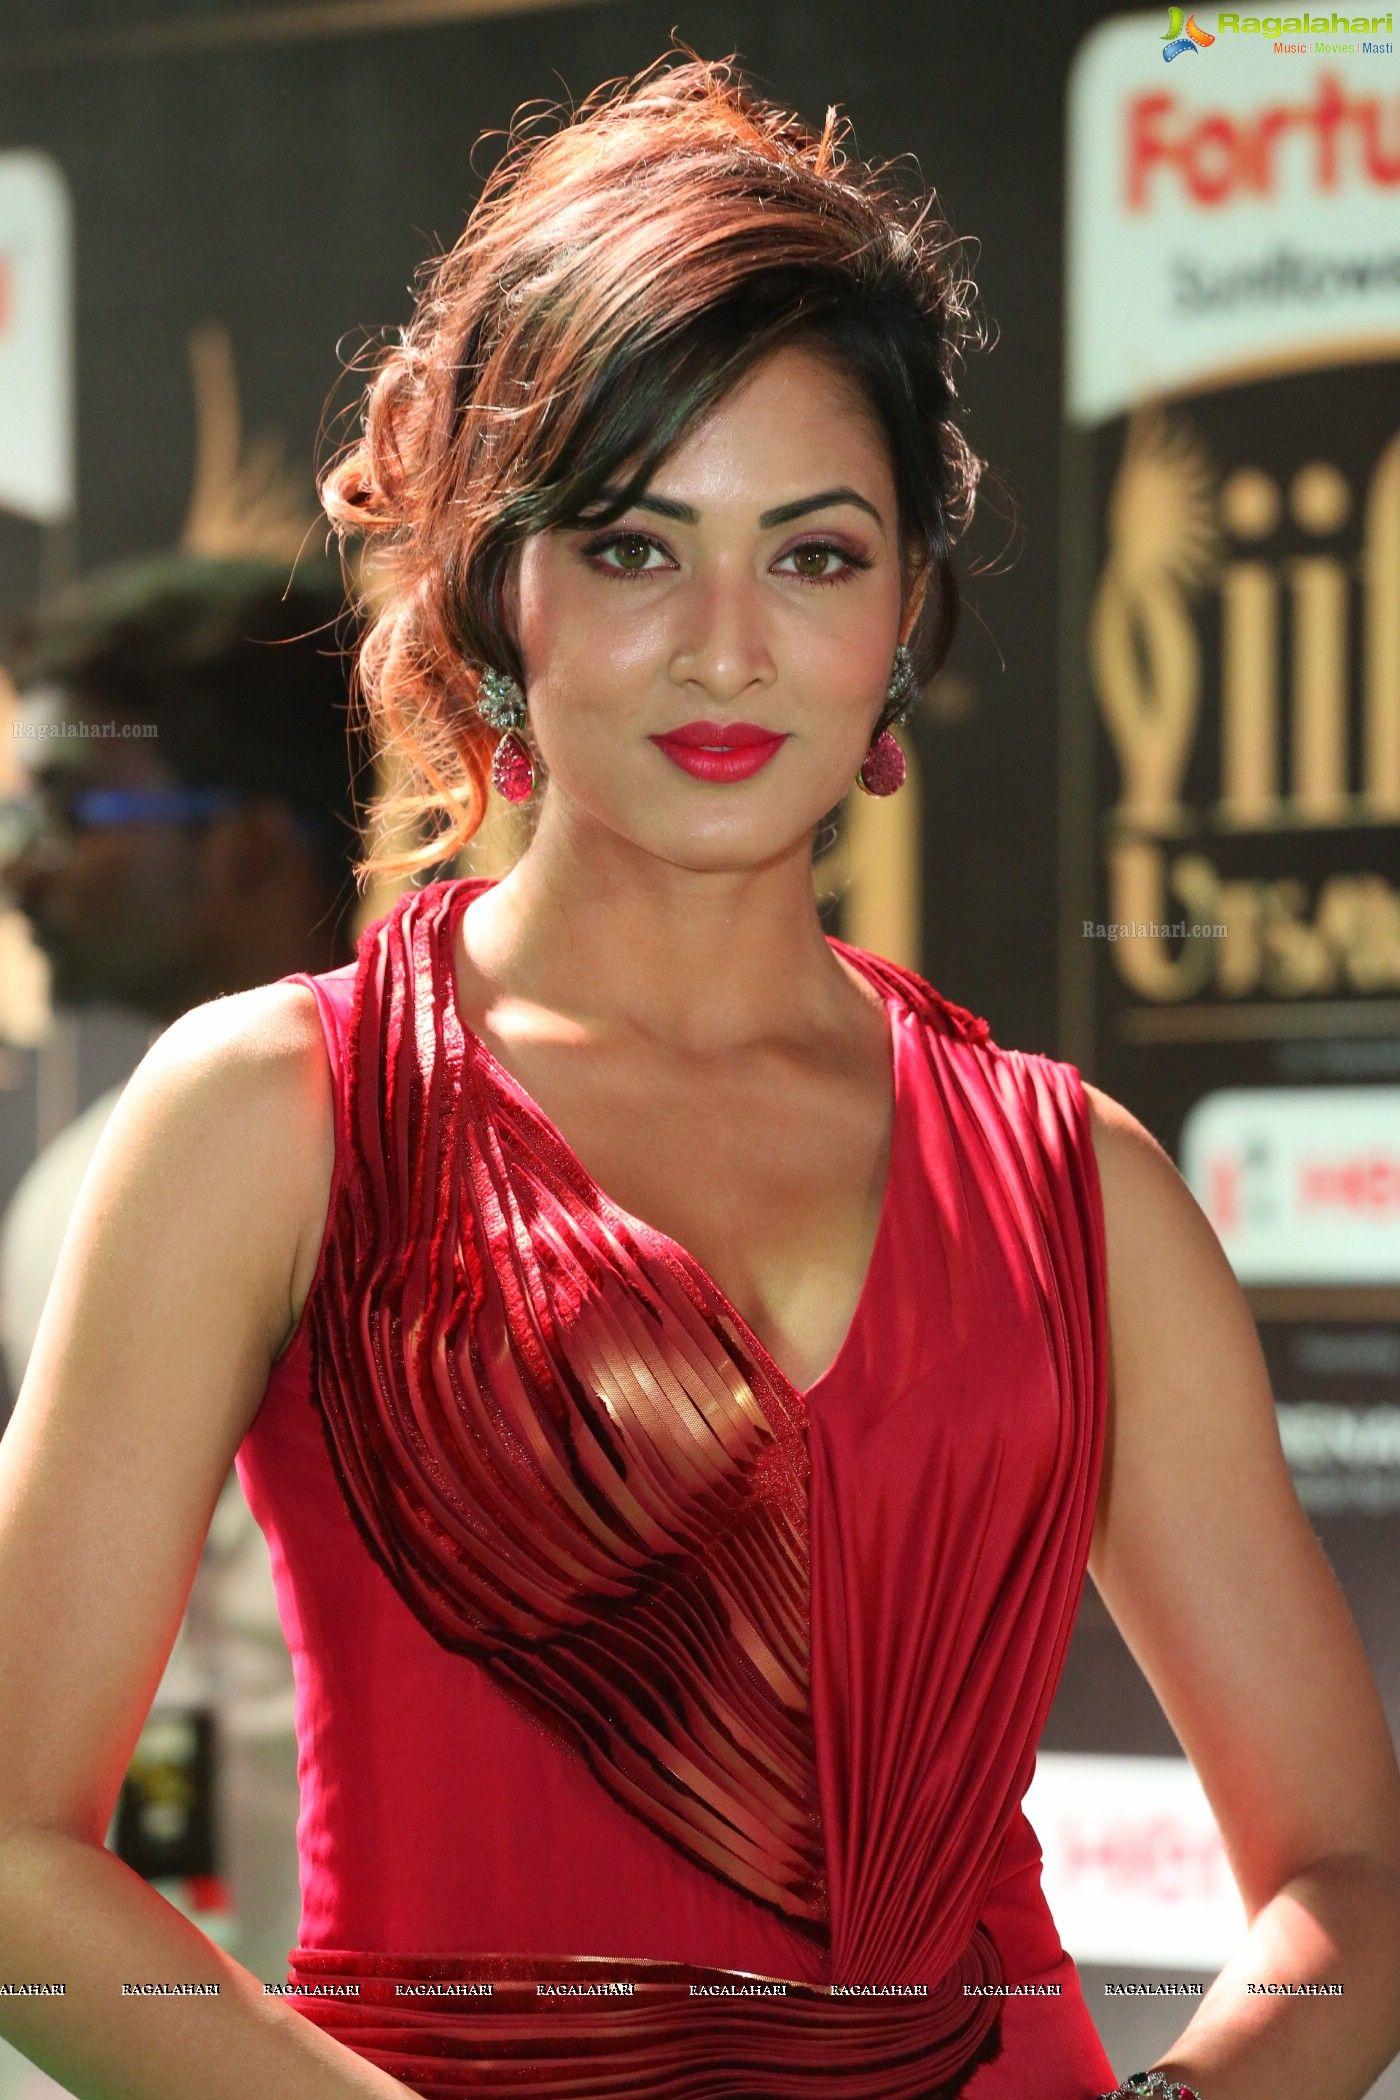 http://www.ragalahari/actress/100886/heroine-vidisha-srivastava